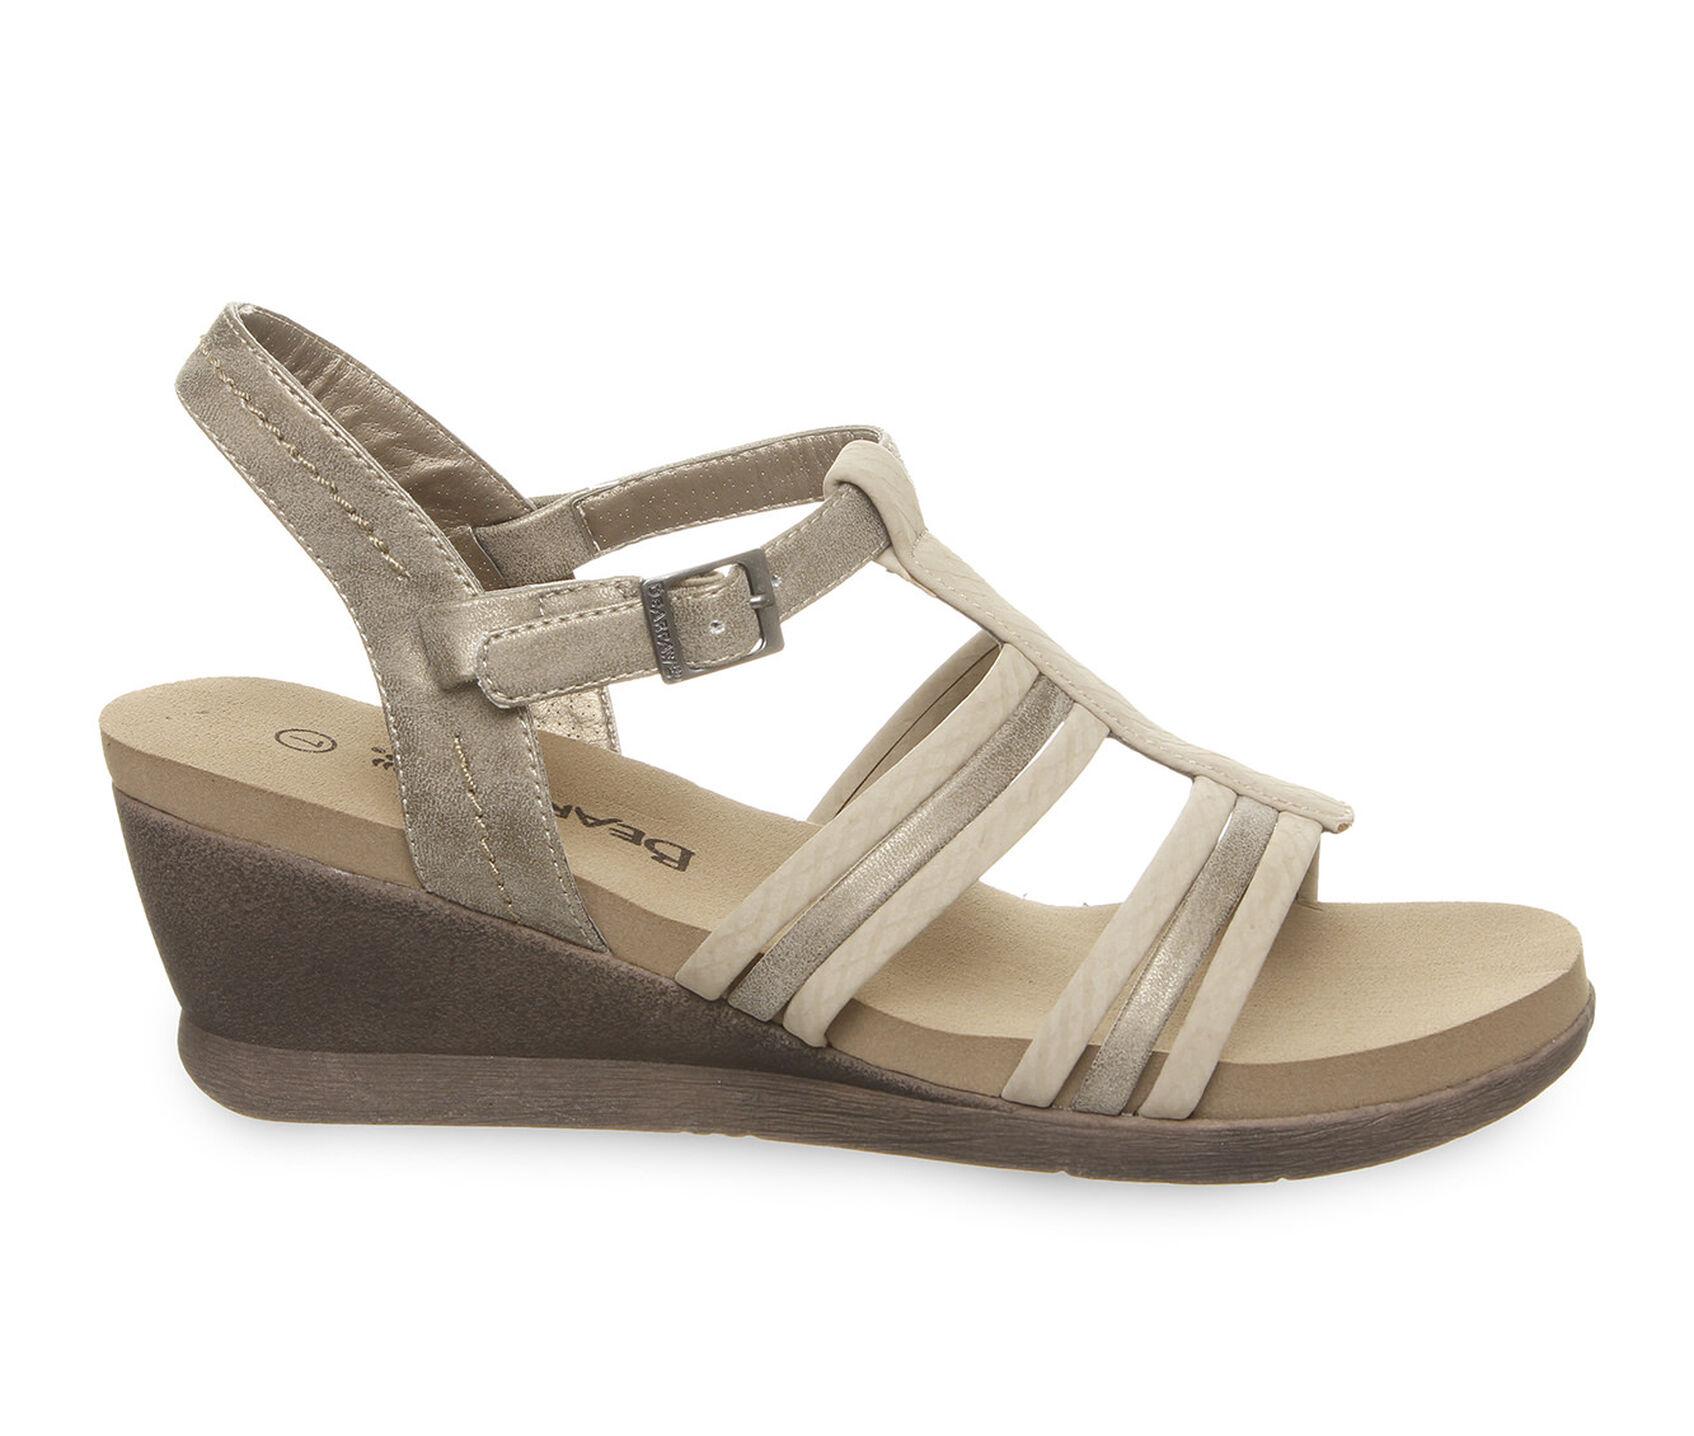 abd805ce0a Women's Bearpaw Viola Strappy Wedge Sandals | Shoe Carnival